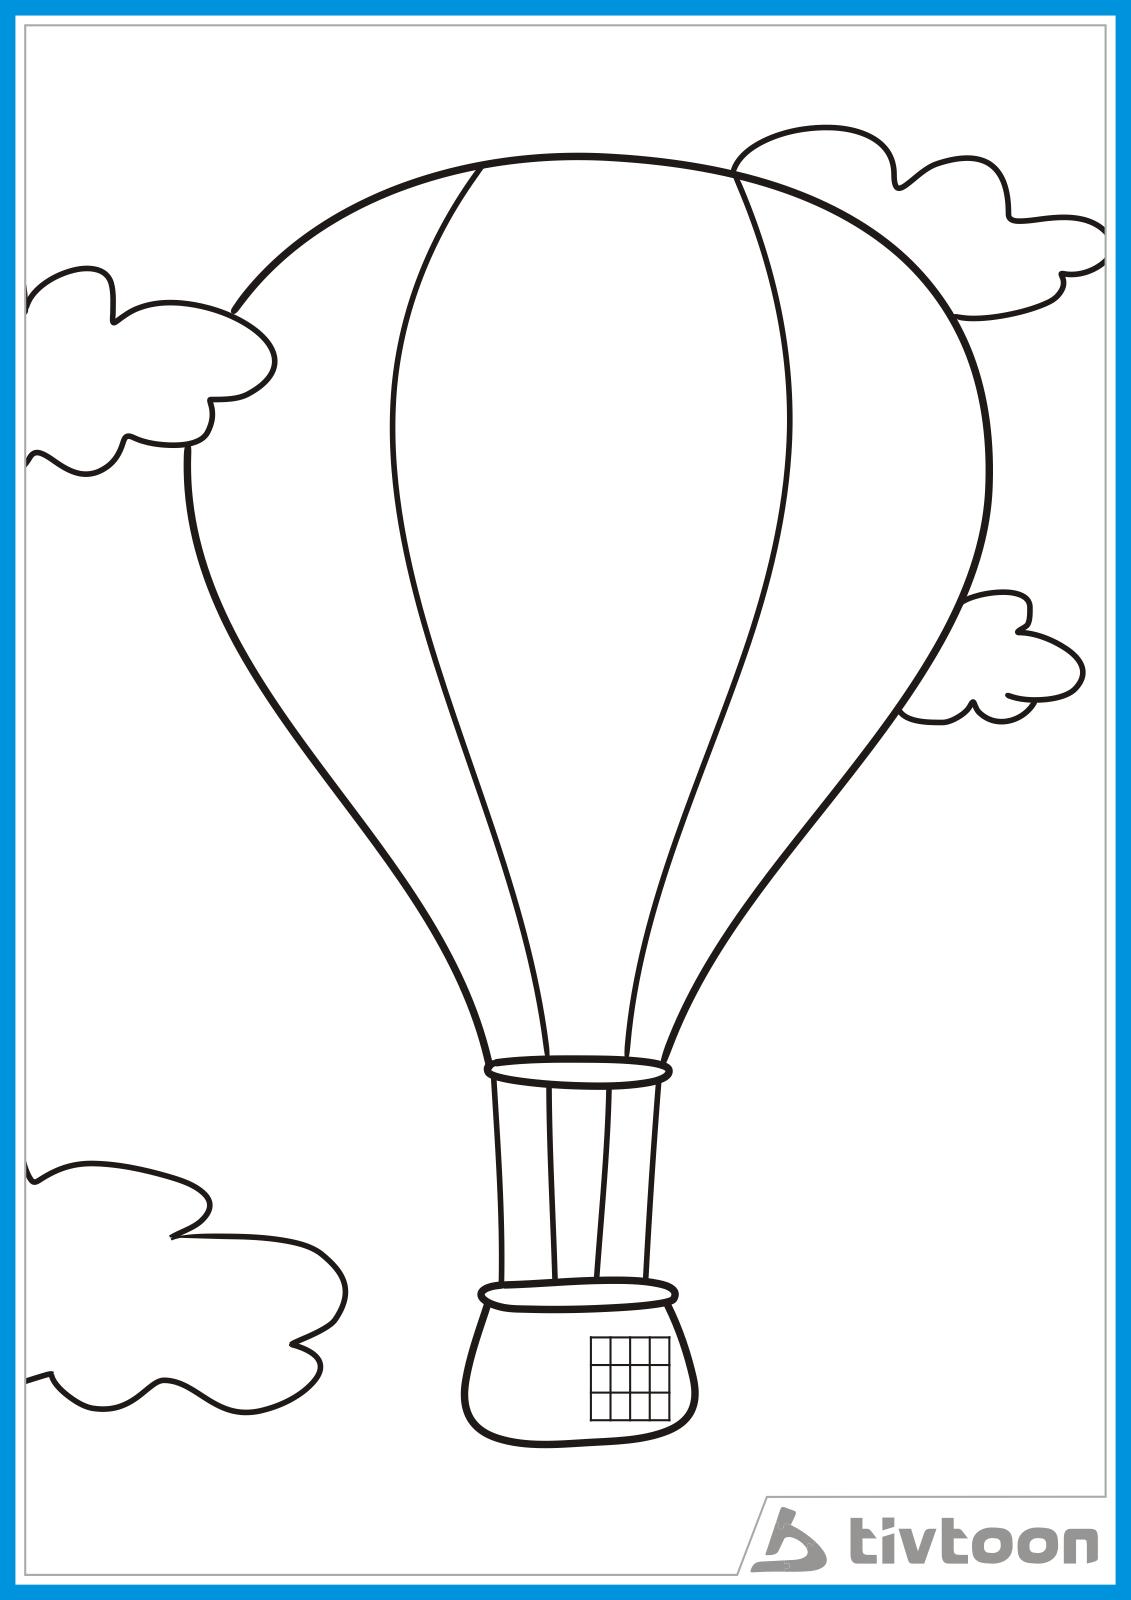 10+ Ide Sketsa Gambar Balon Udara Yang Mudah Digambar - Tea And Lead